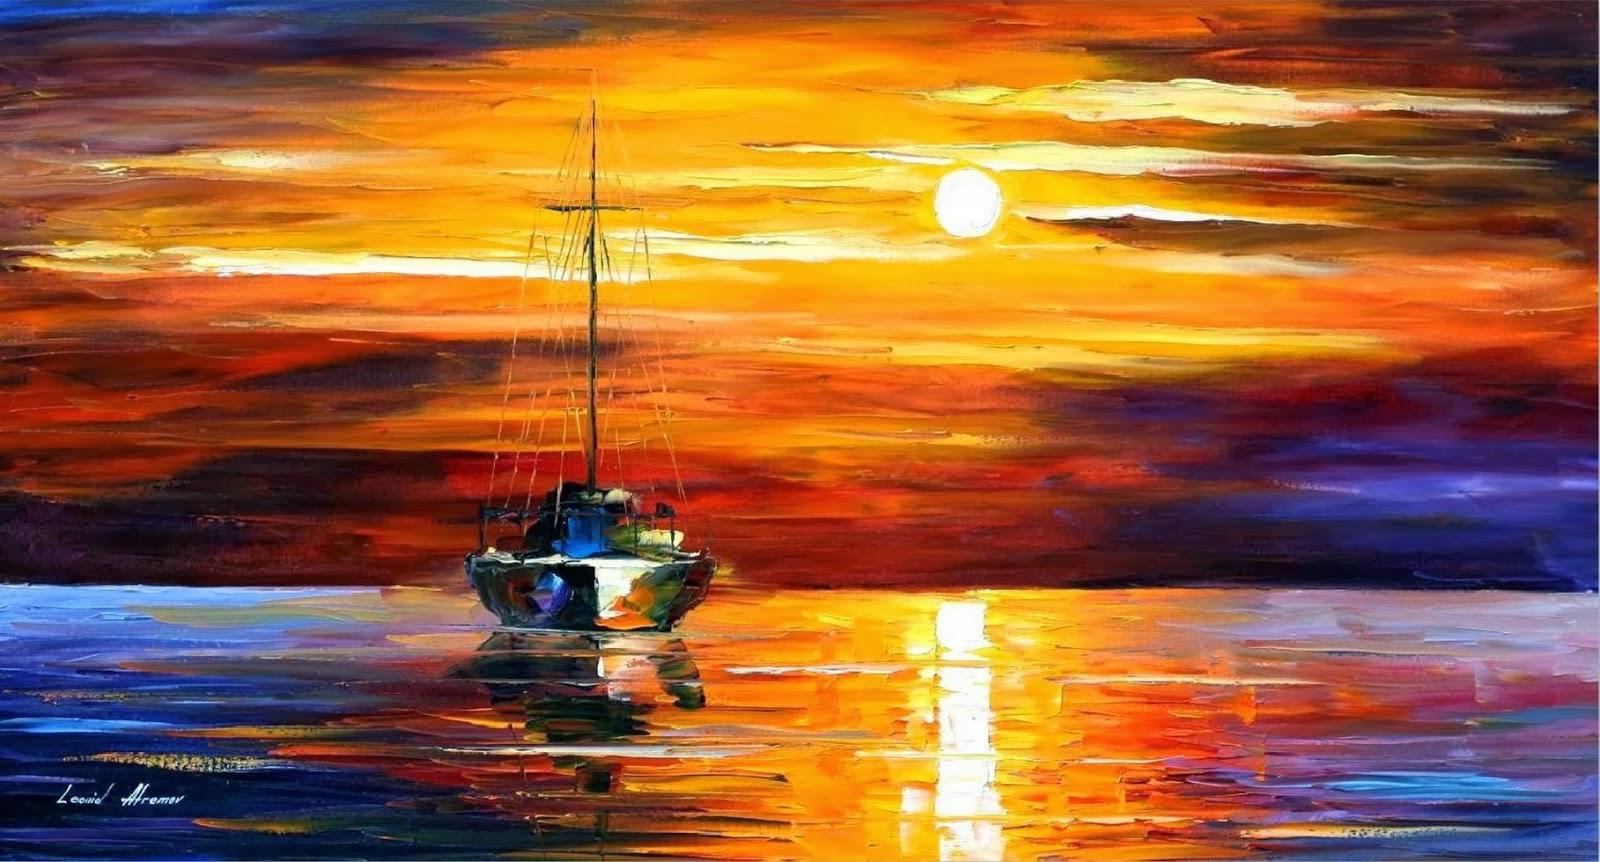 Drawing Lines With Oil Paint : Pintura moderna y fotografía artística paisajes marinos